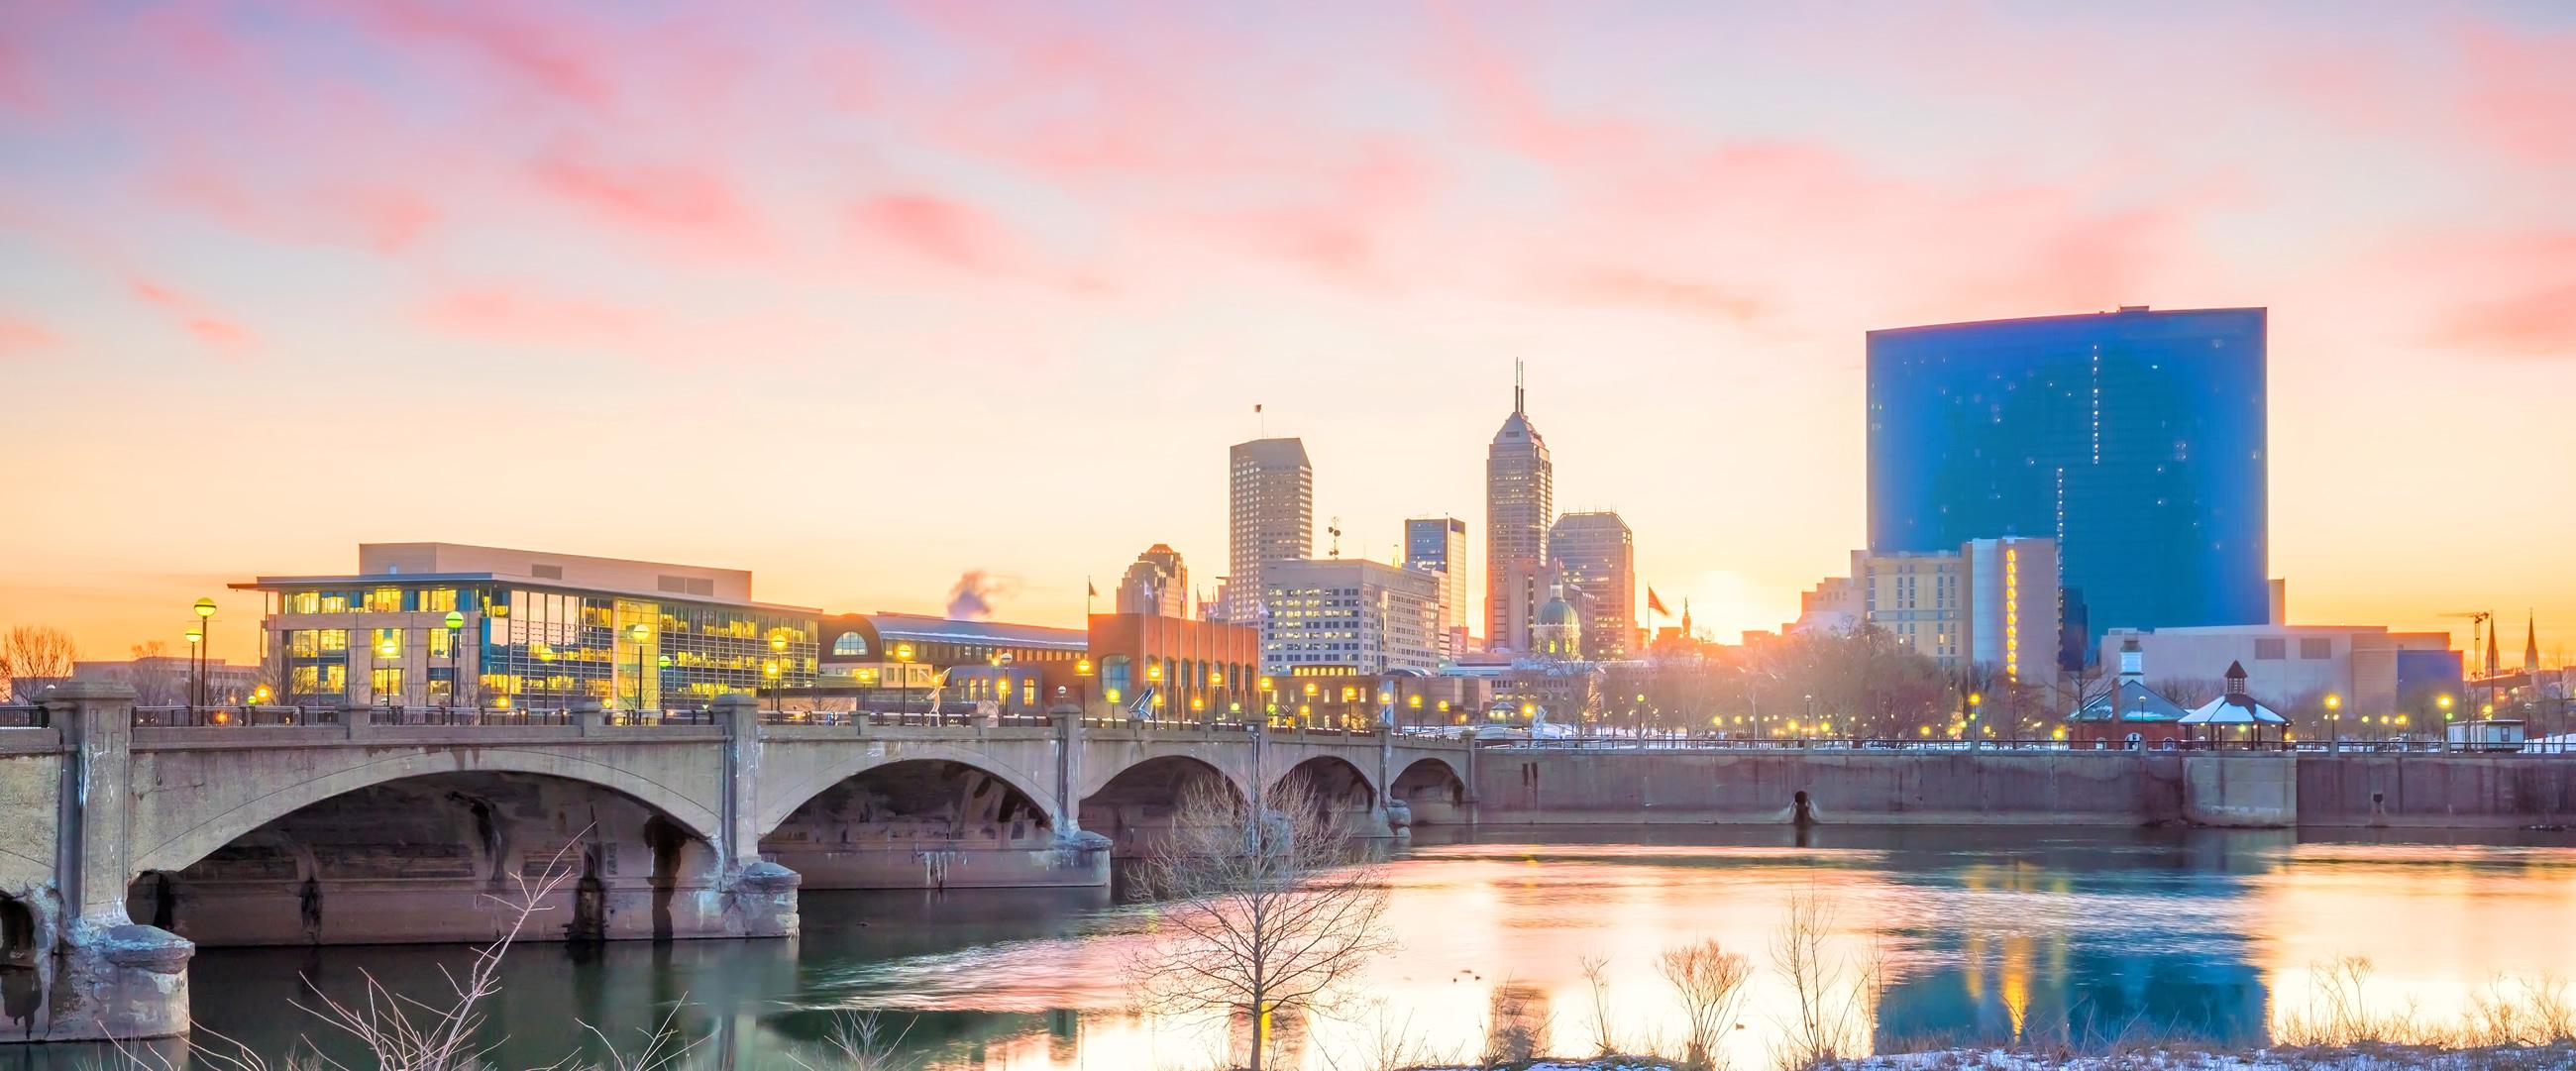 Indianapolis Criminal Defense, Family Law & Lemon Law